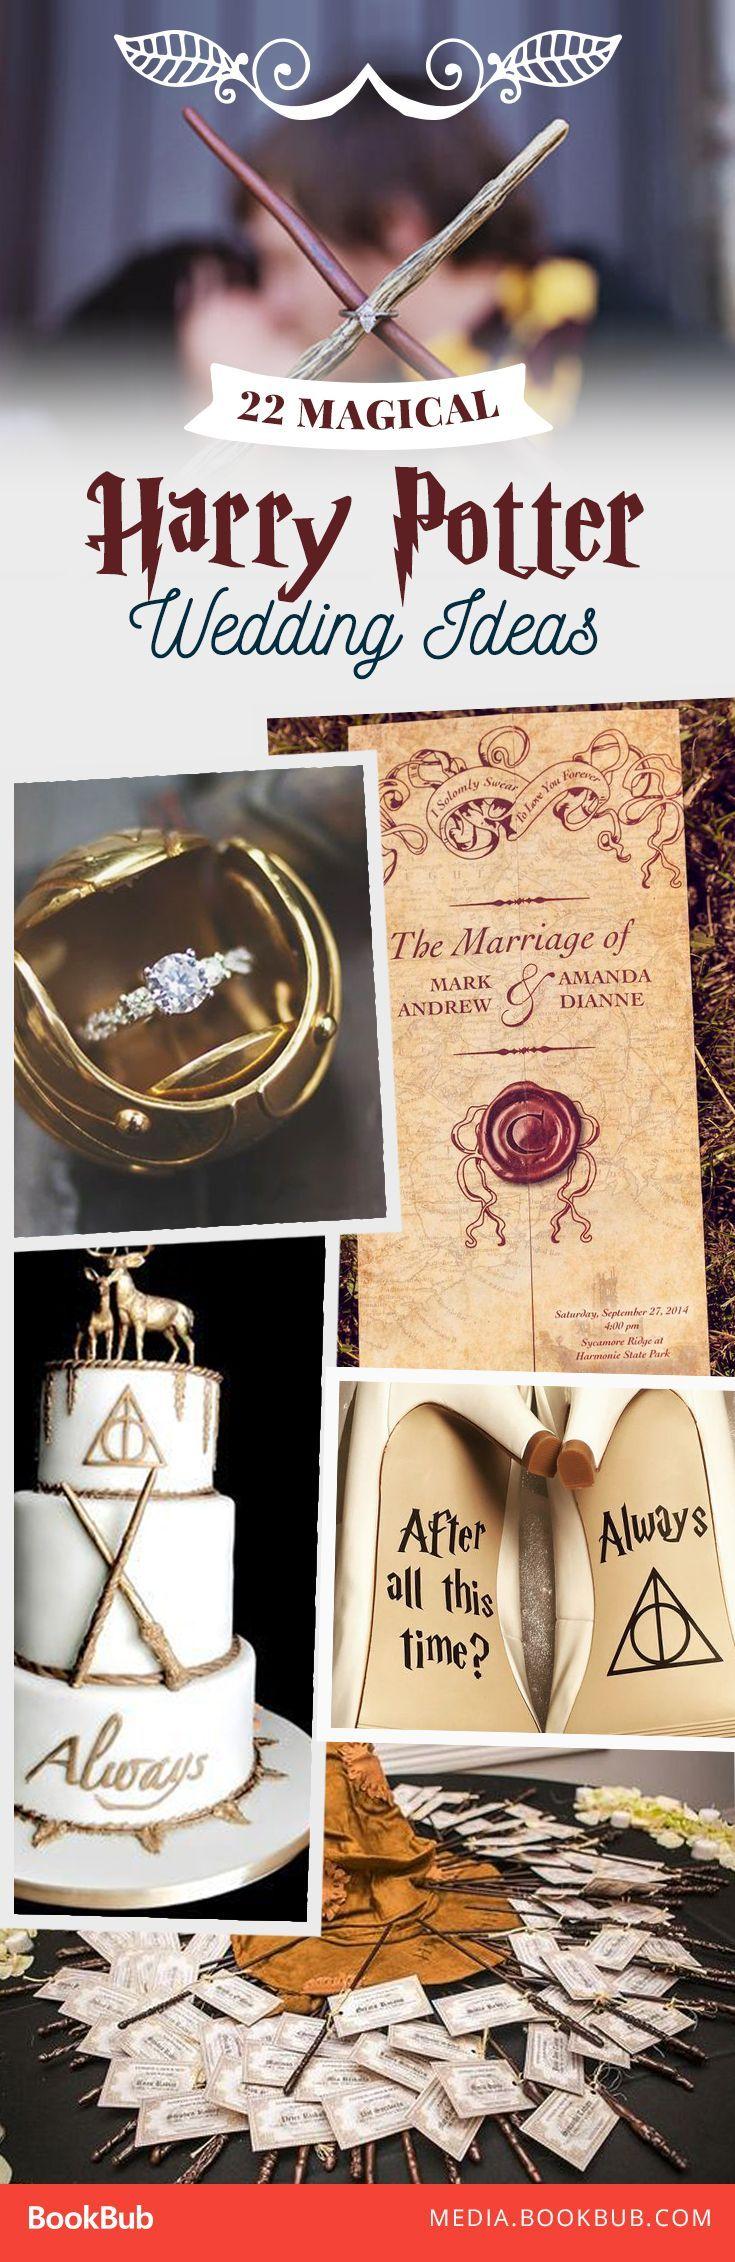 20 magische 'Harry Potter'-Hochzeitsideen …